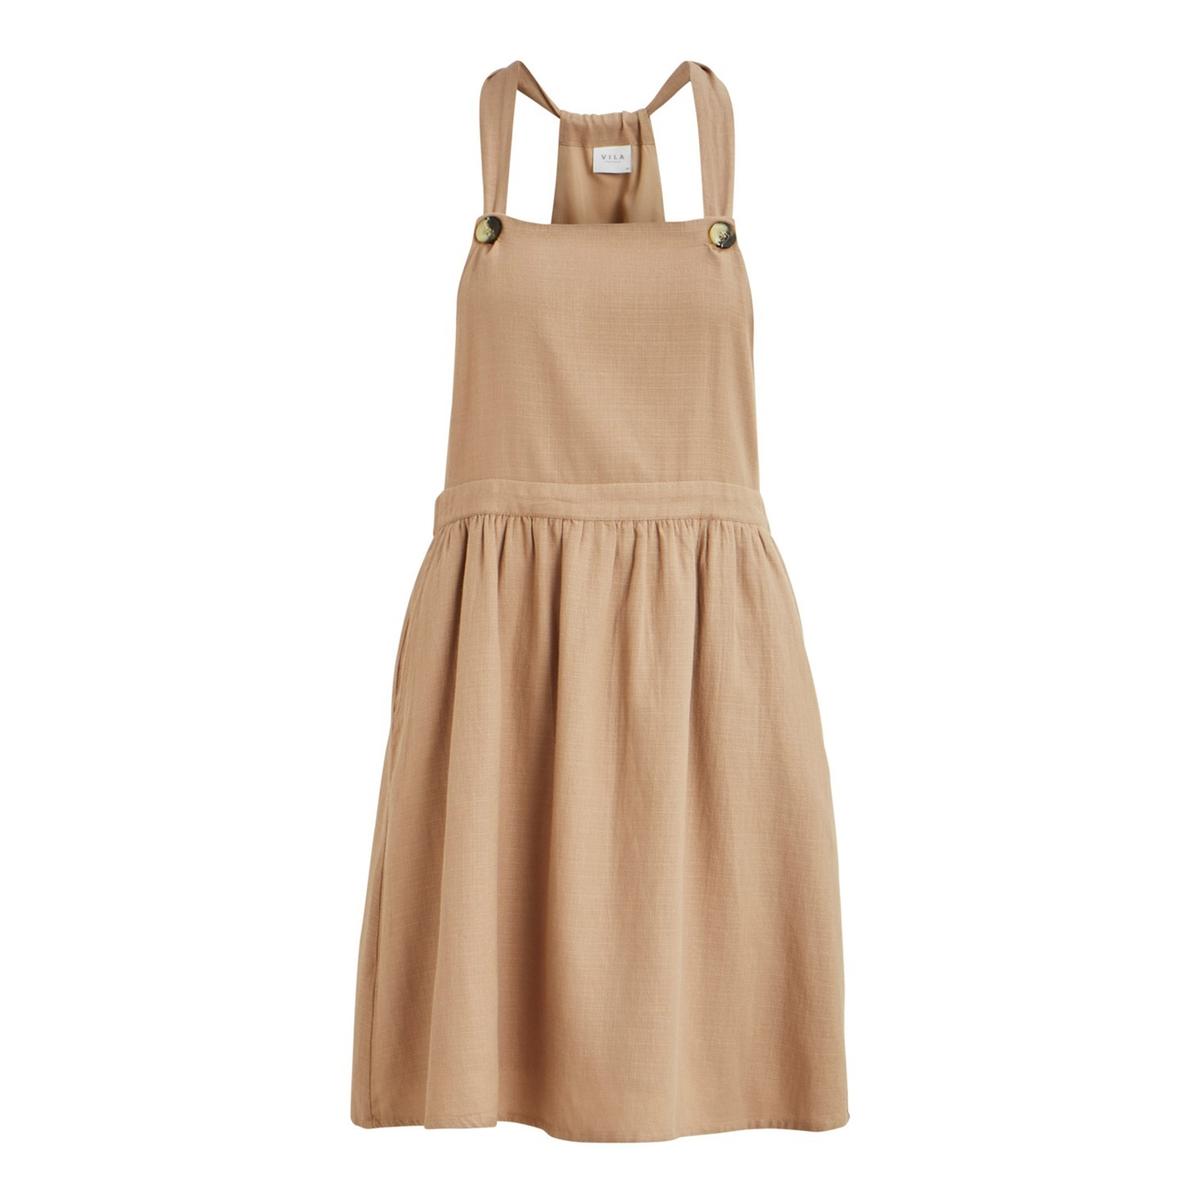 Платье-комбинезон La Redoute Vikaluna 34 (FR) - 40 (RUS) бежевый бушлат la redoute с рисунком клетка 34 fr 40 rus каштановый